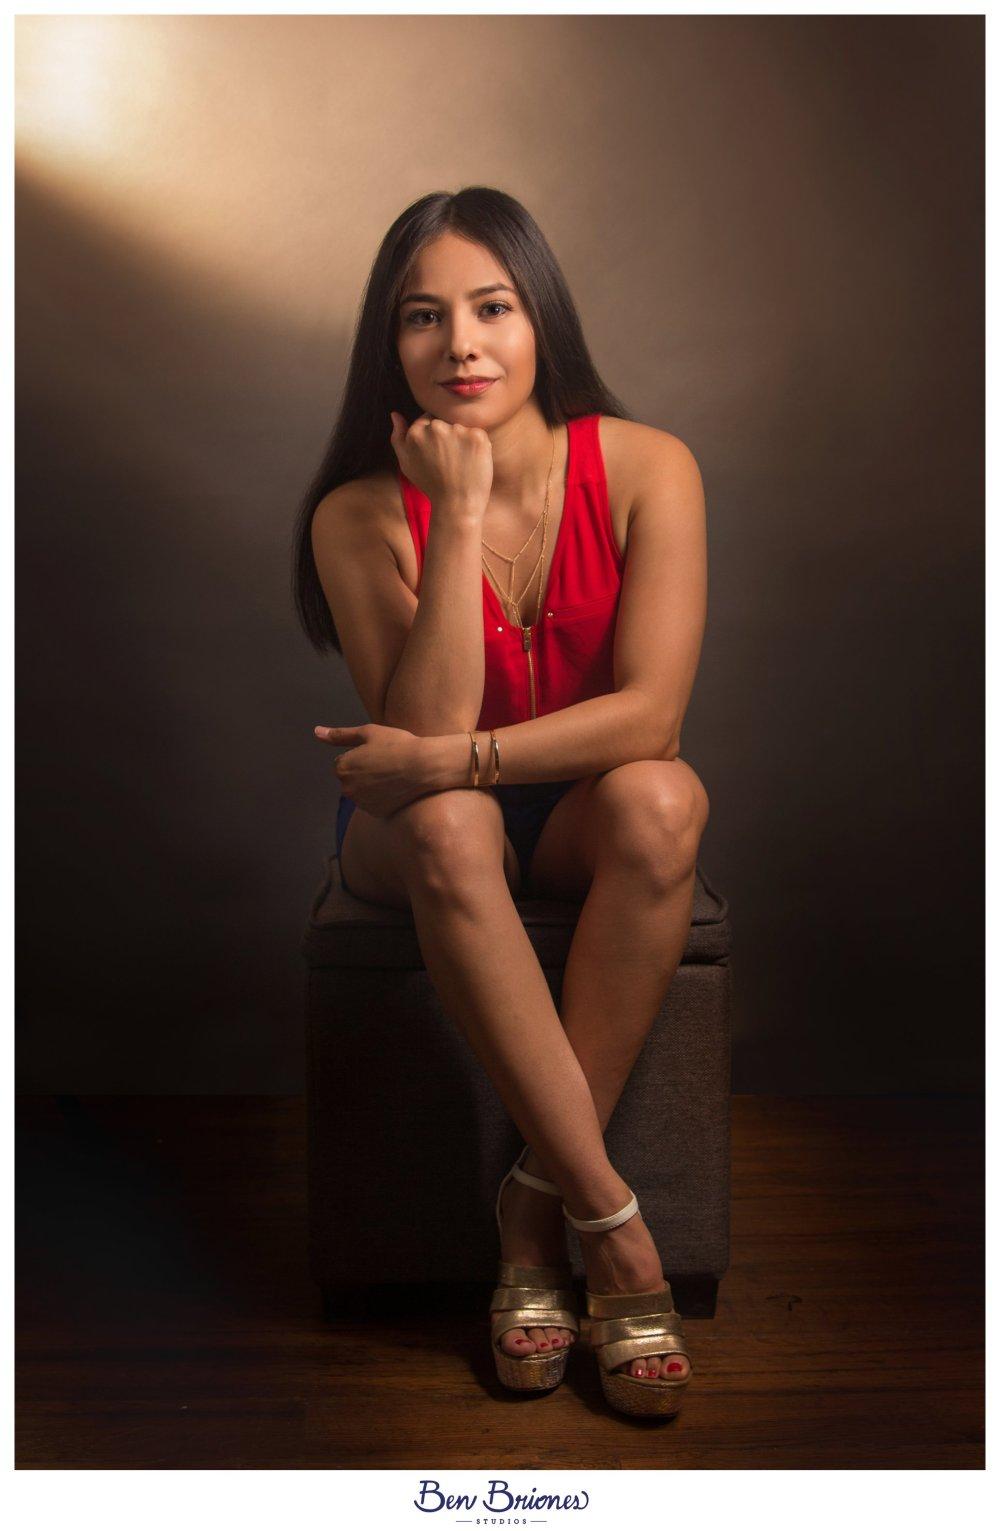 06.03.17_PRINT_Lorena Garcia Portraits_BBS-6230_pp